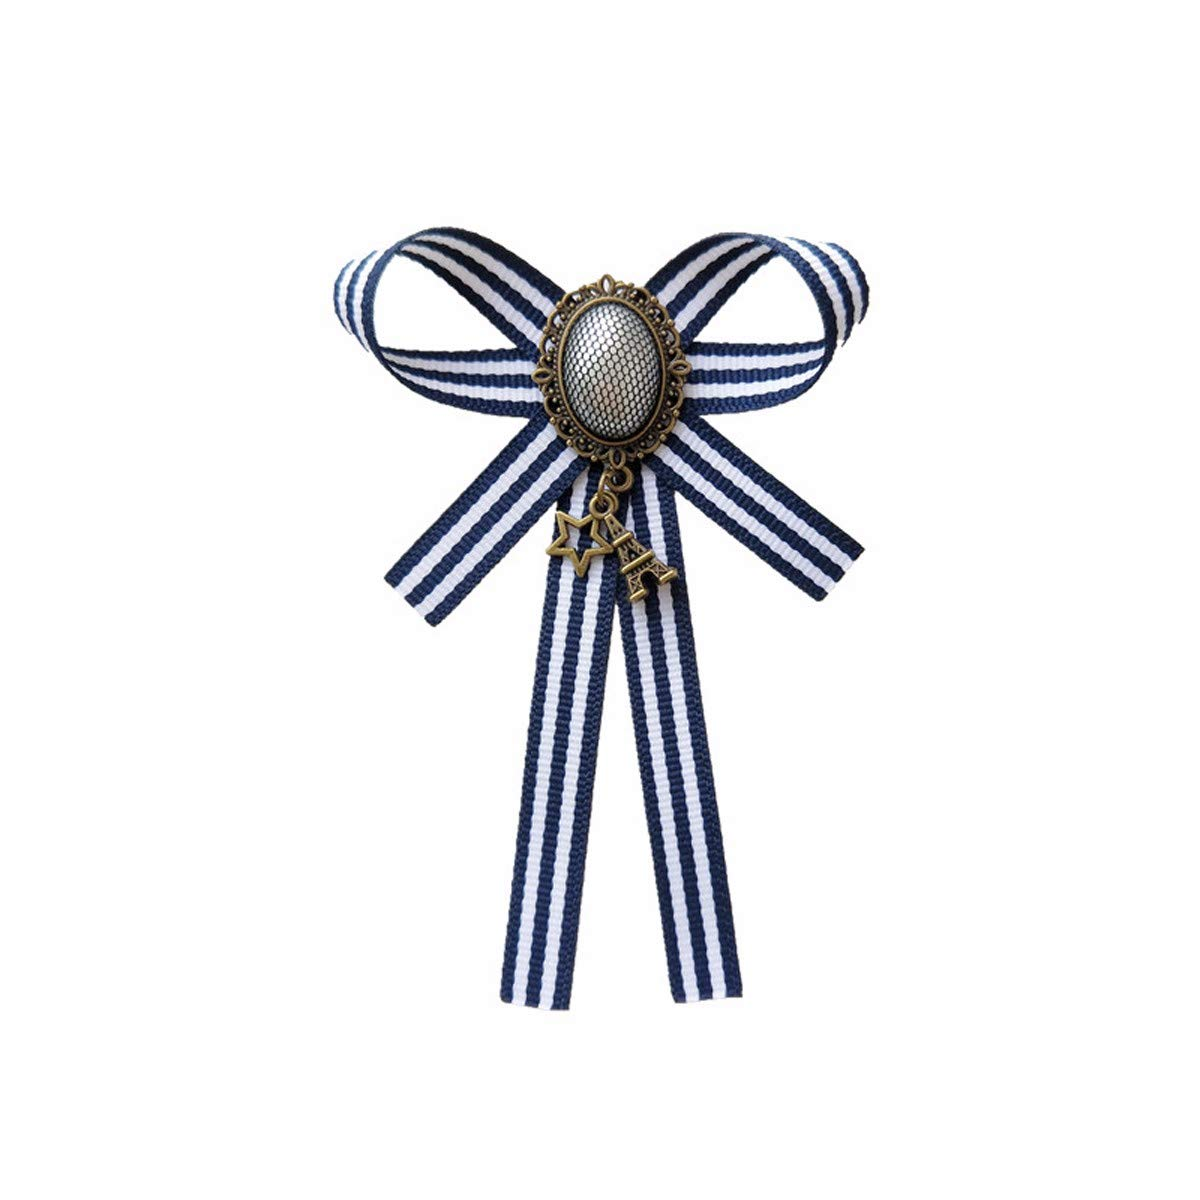 KUNQ-Retro Stripes Perla Corbatas Banco Moños Lazos Cuello De ...